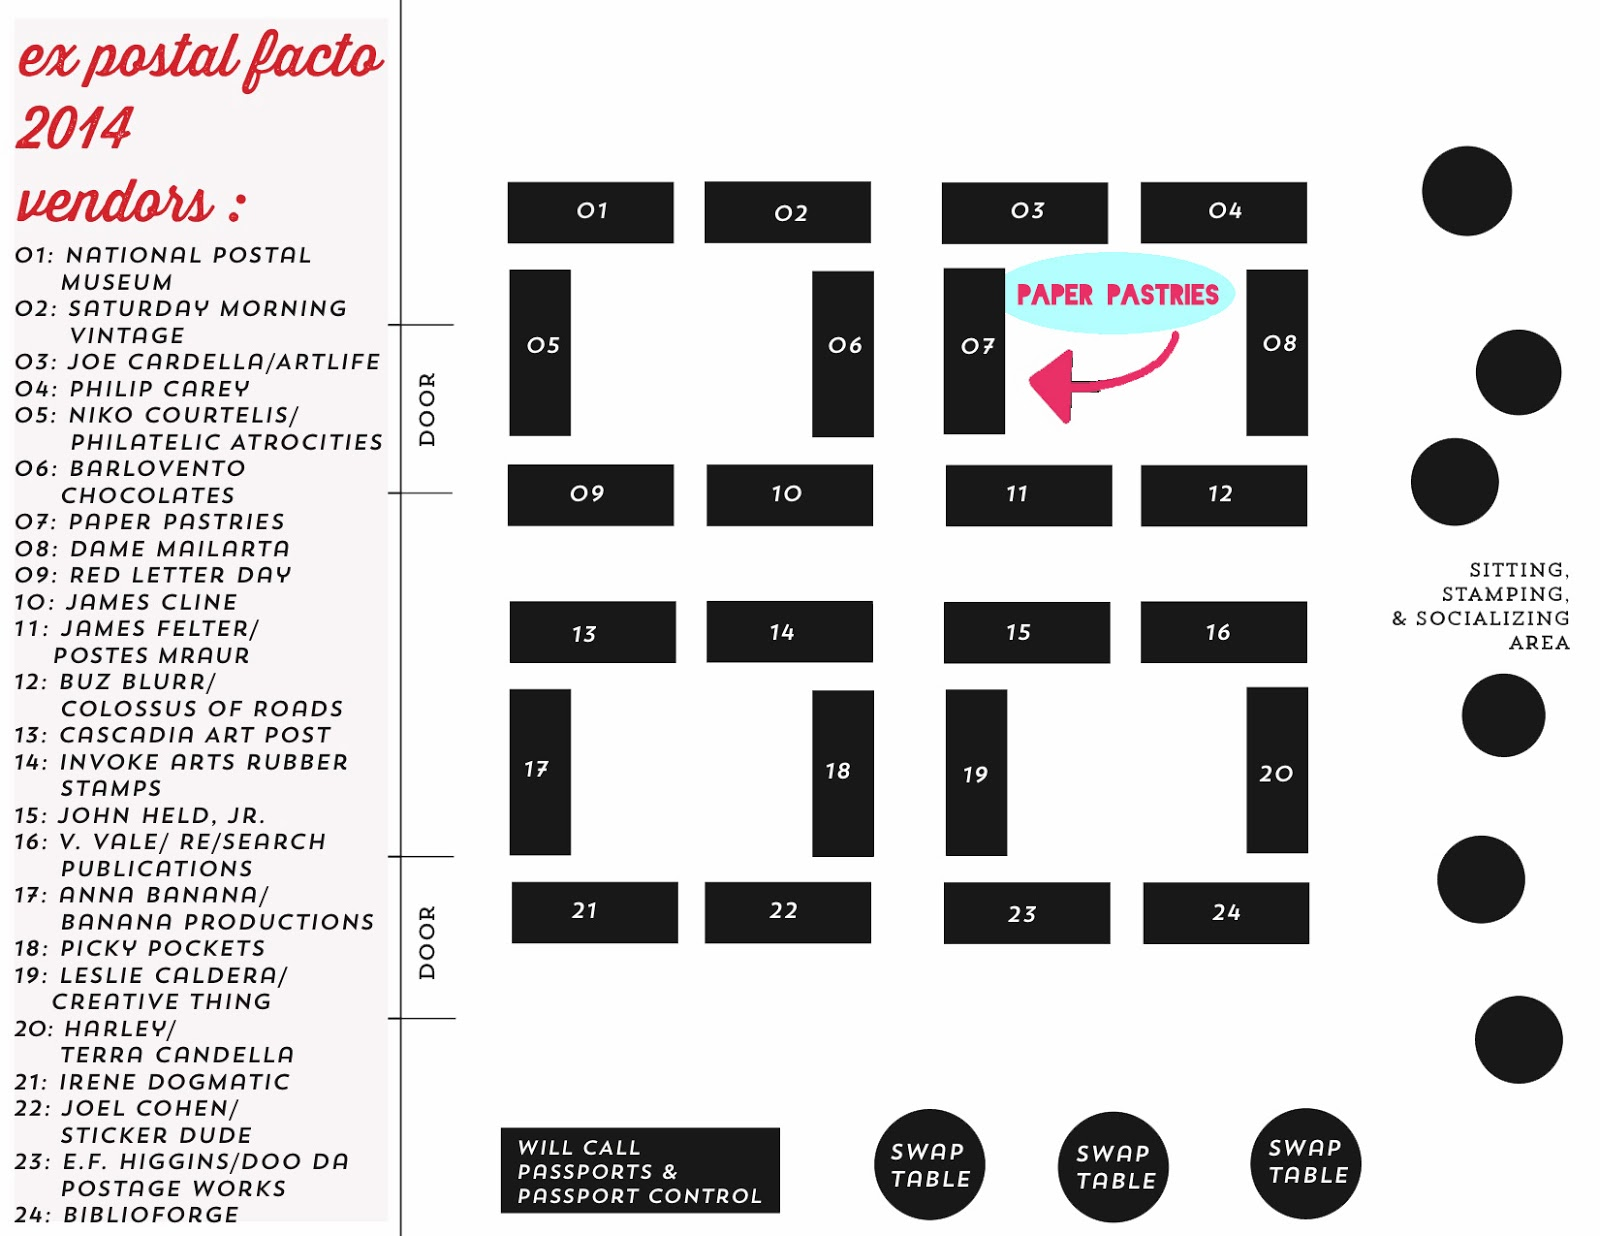 epl table 2015 16 pdf